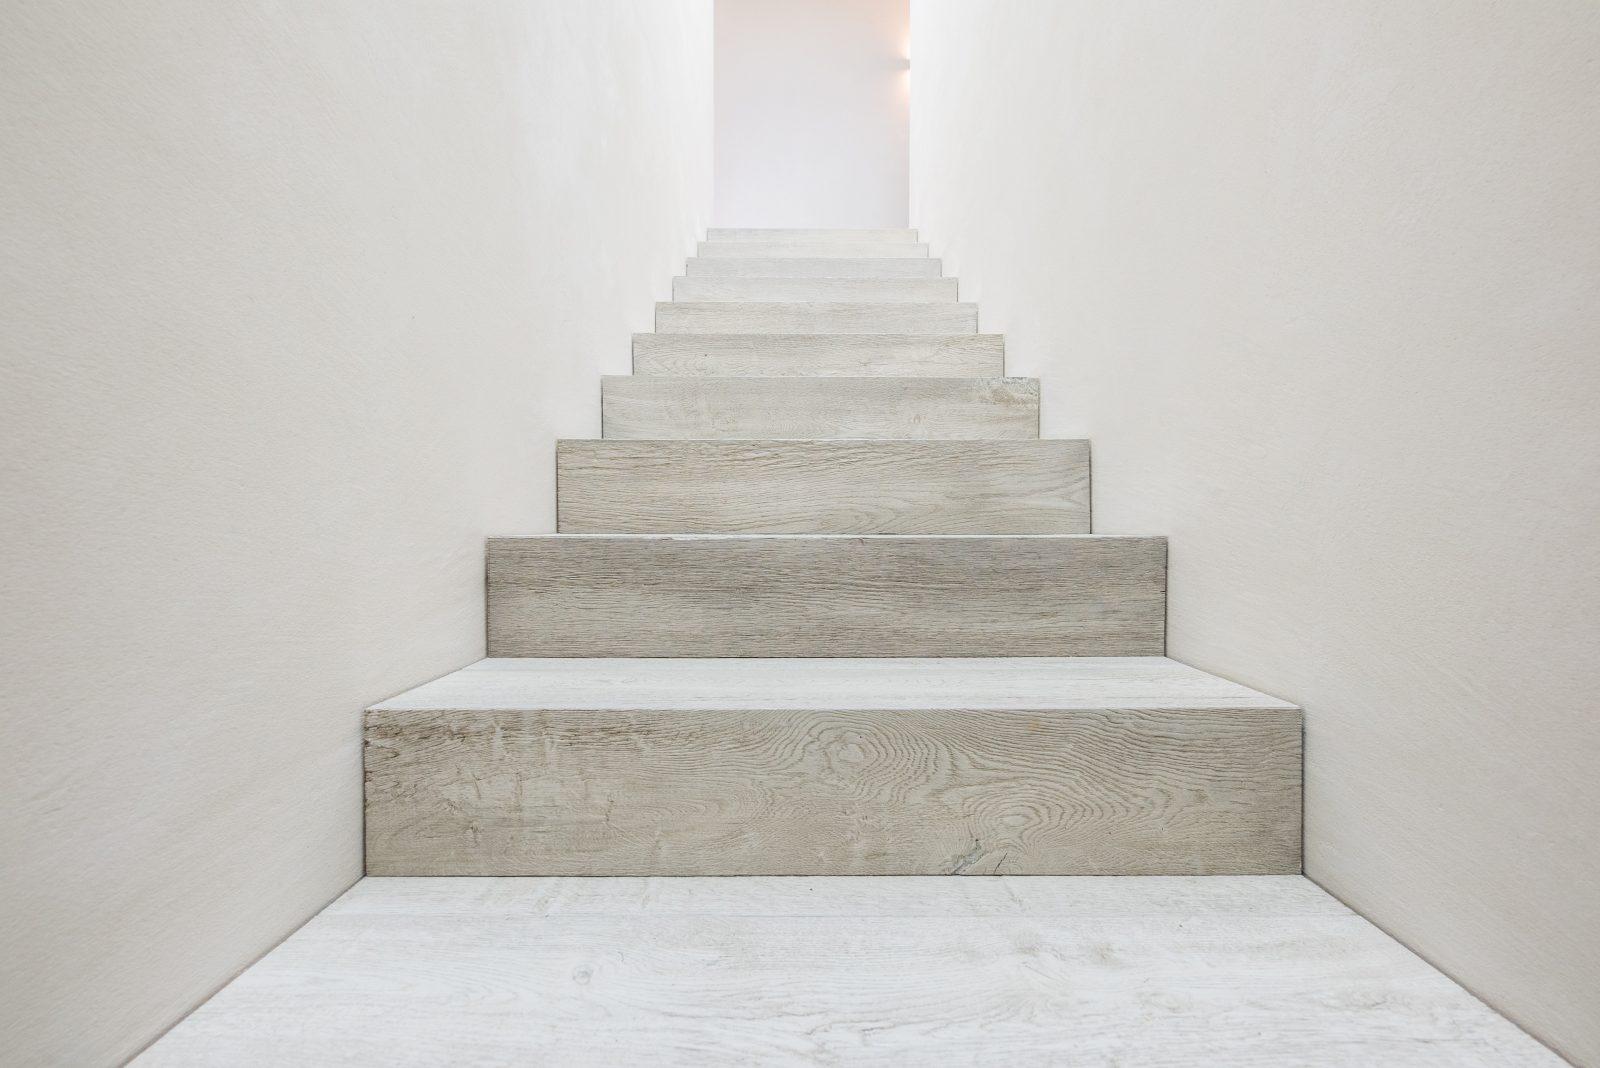 residenza-privata-boffi-studio-frauenfeld-ph-balz-kubli